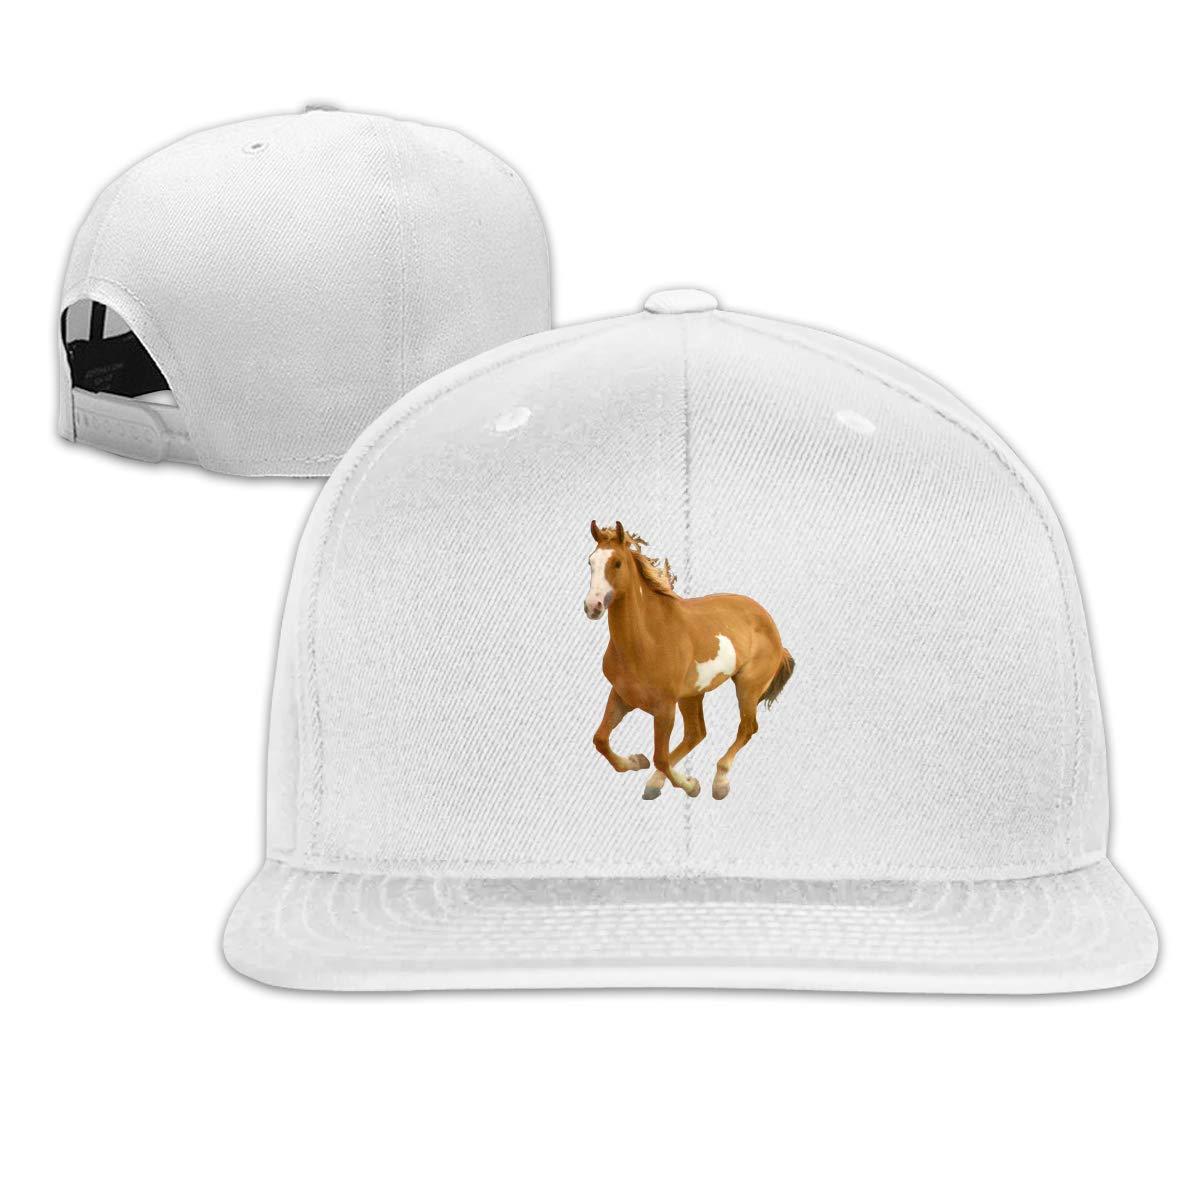 Xieadery Horse Running Flat Brim Baseball Cap Adjustable Snapback Trucker Hat Caps Hip Hop Hat